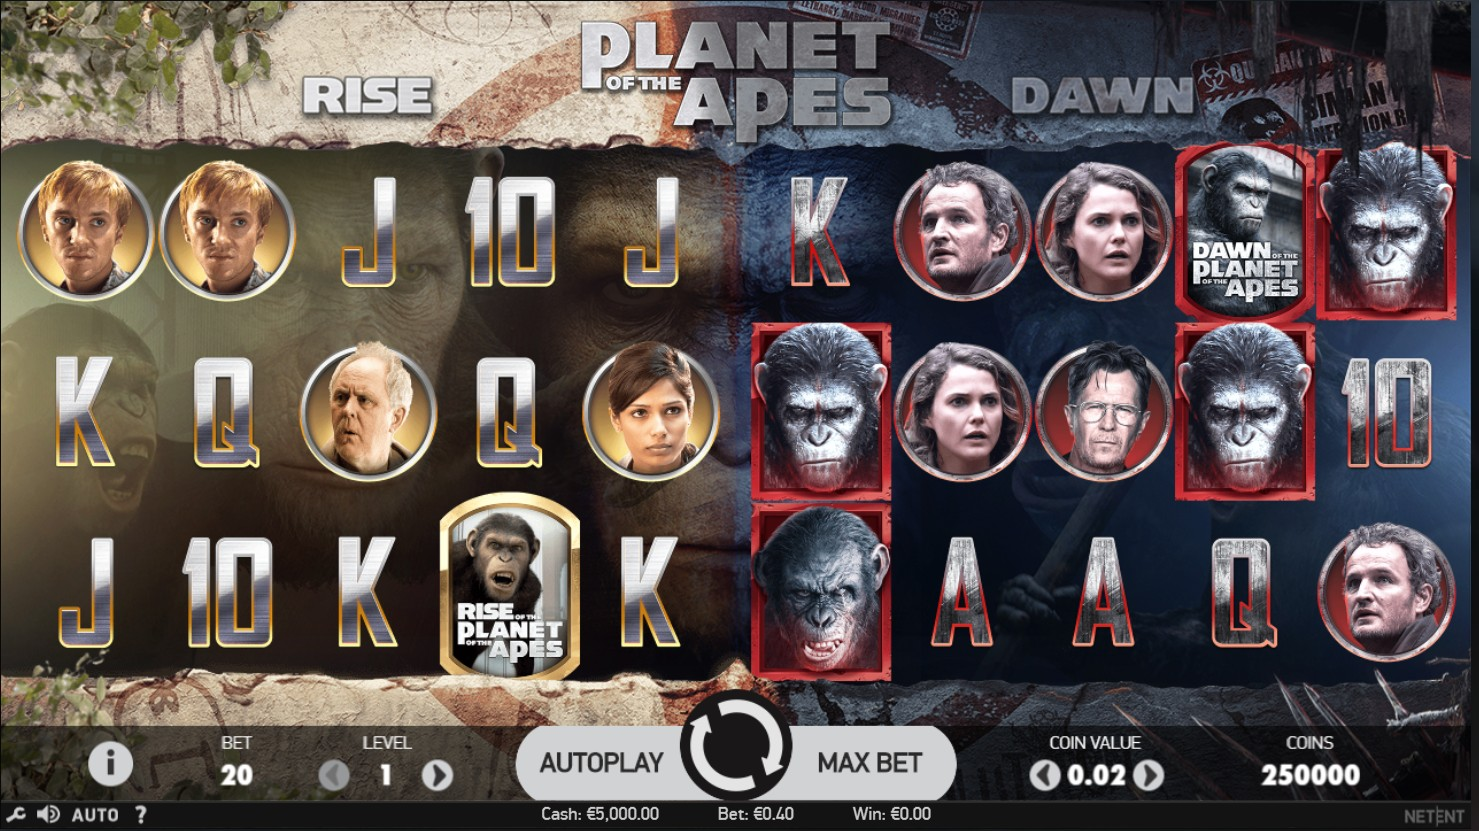 Branded Slot - Planet of the Apes เล่นสล็อต วิธีเล่นสล็อต